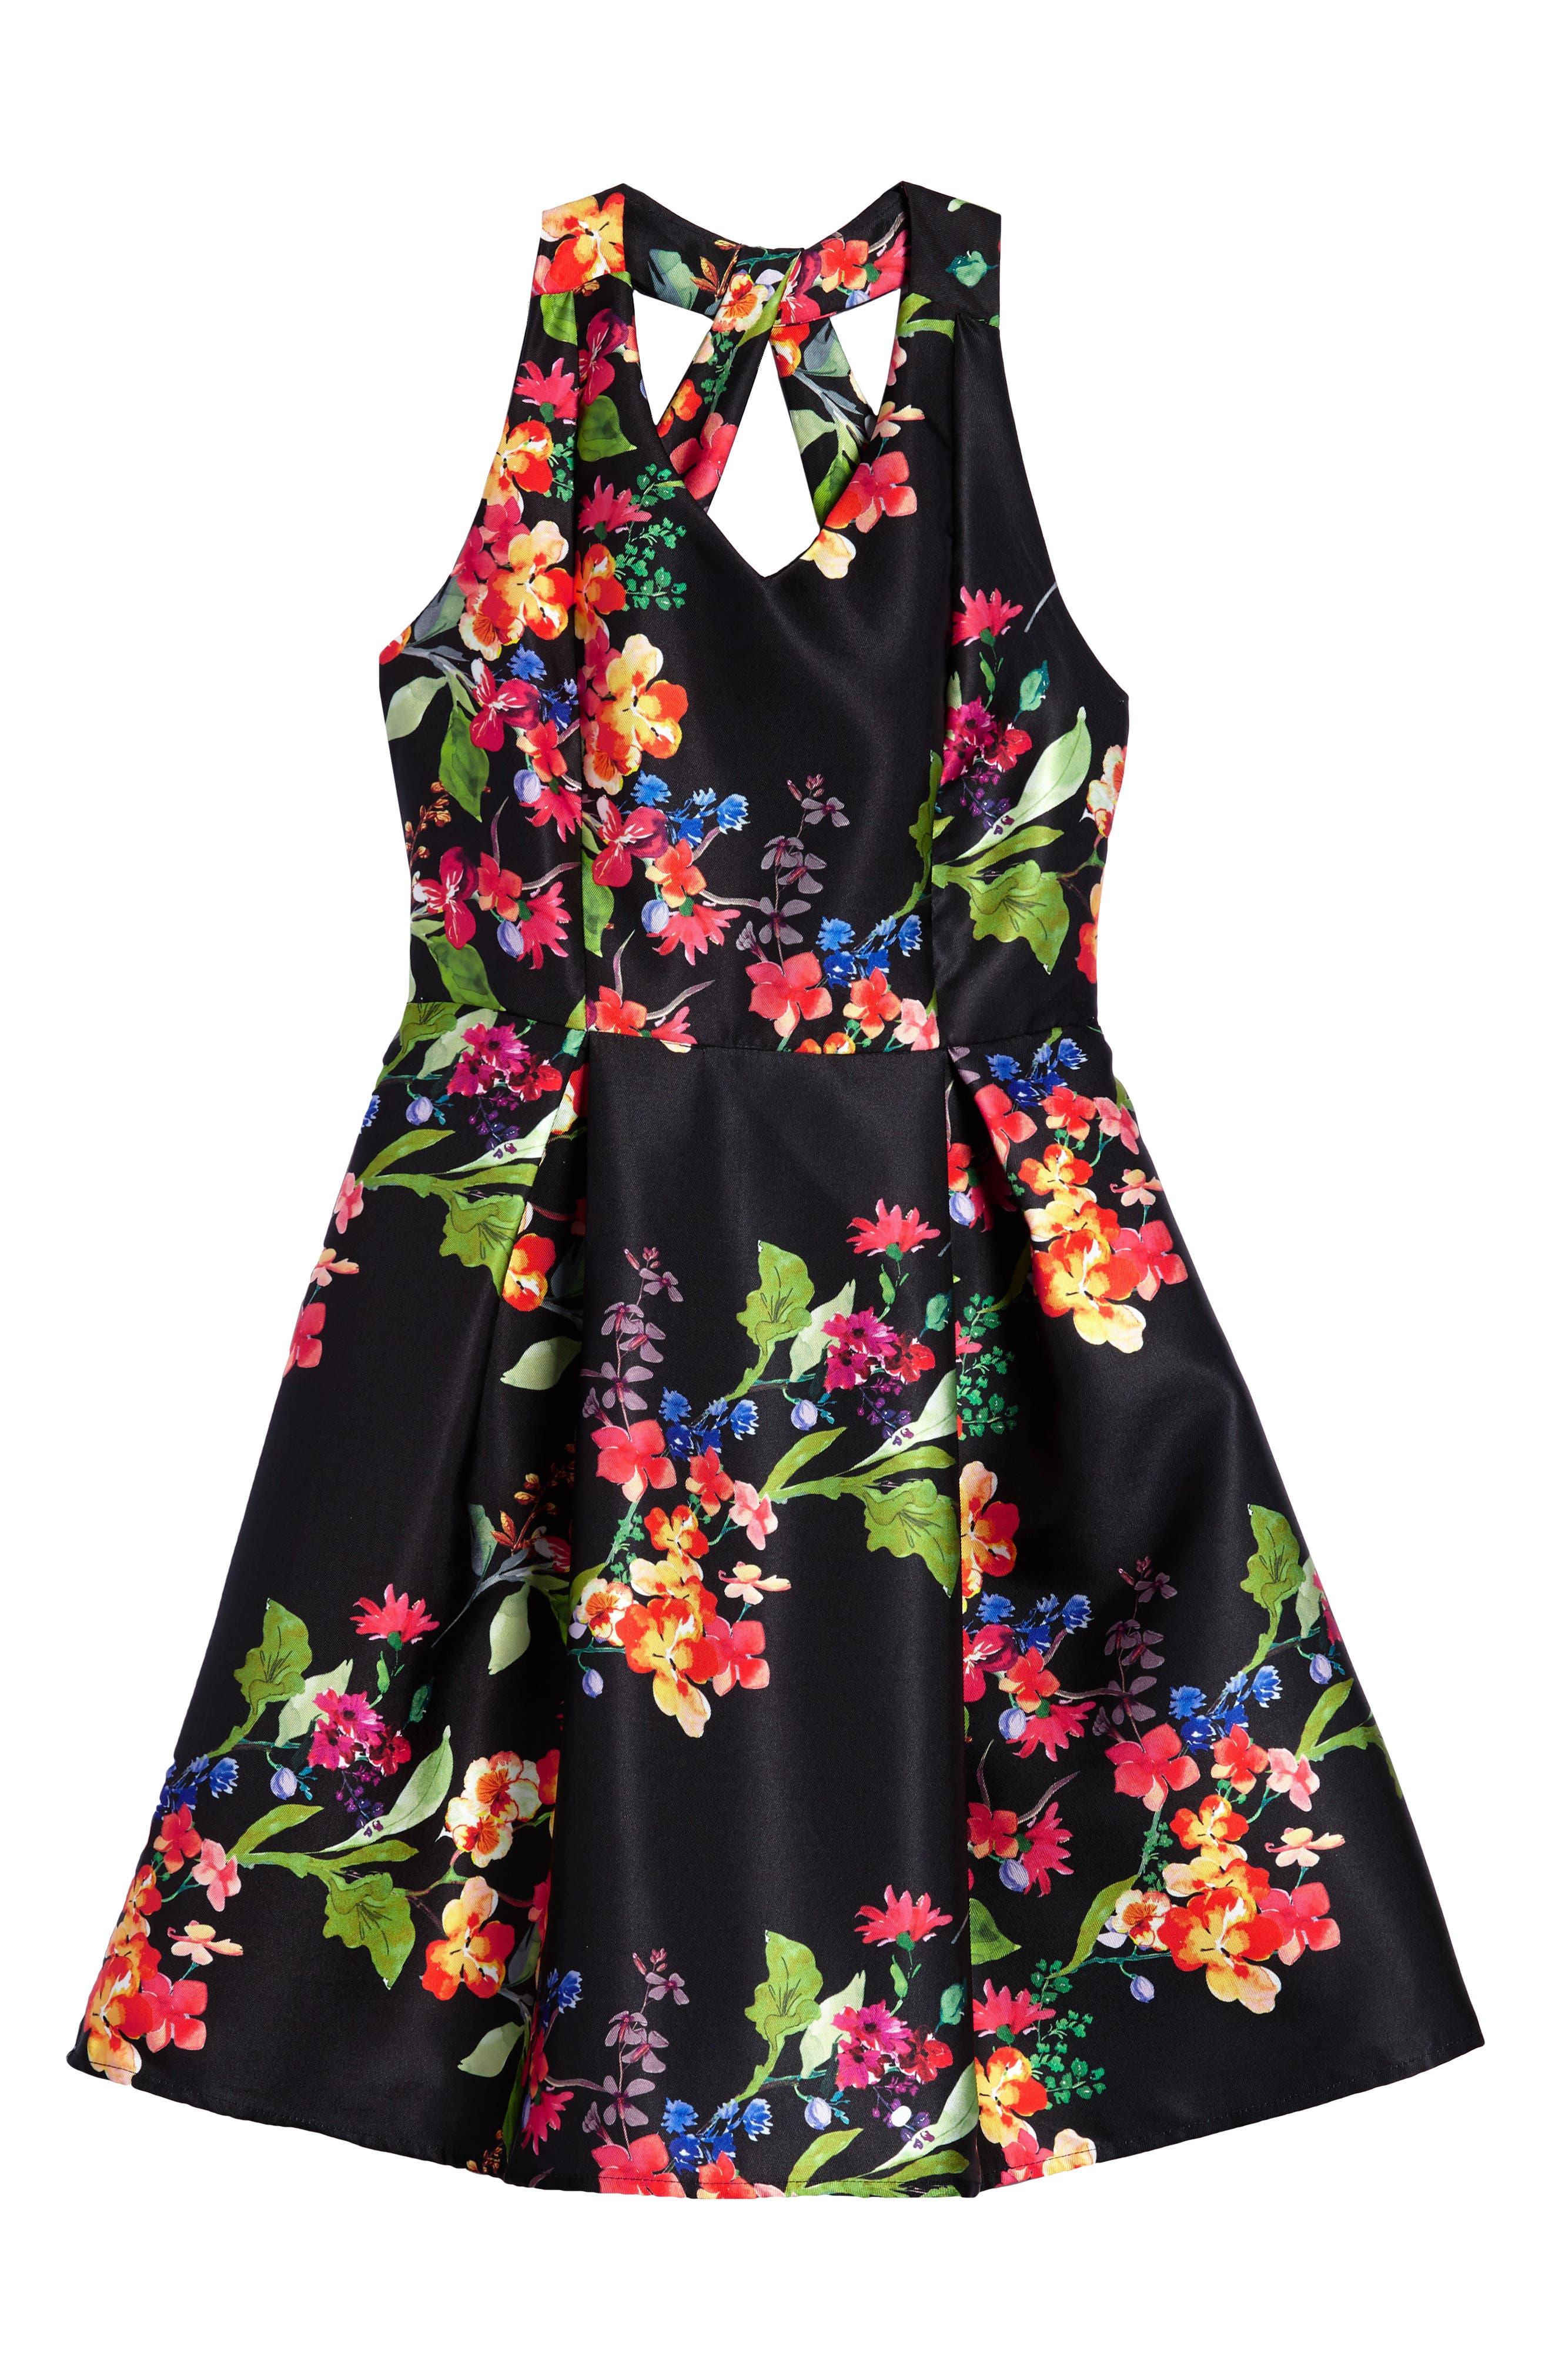 Main Image - Love, Nickie Lew Floral Print Halter Dress (Big Girls)